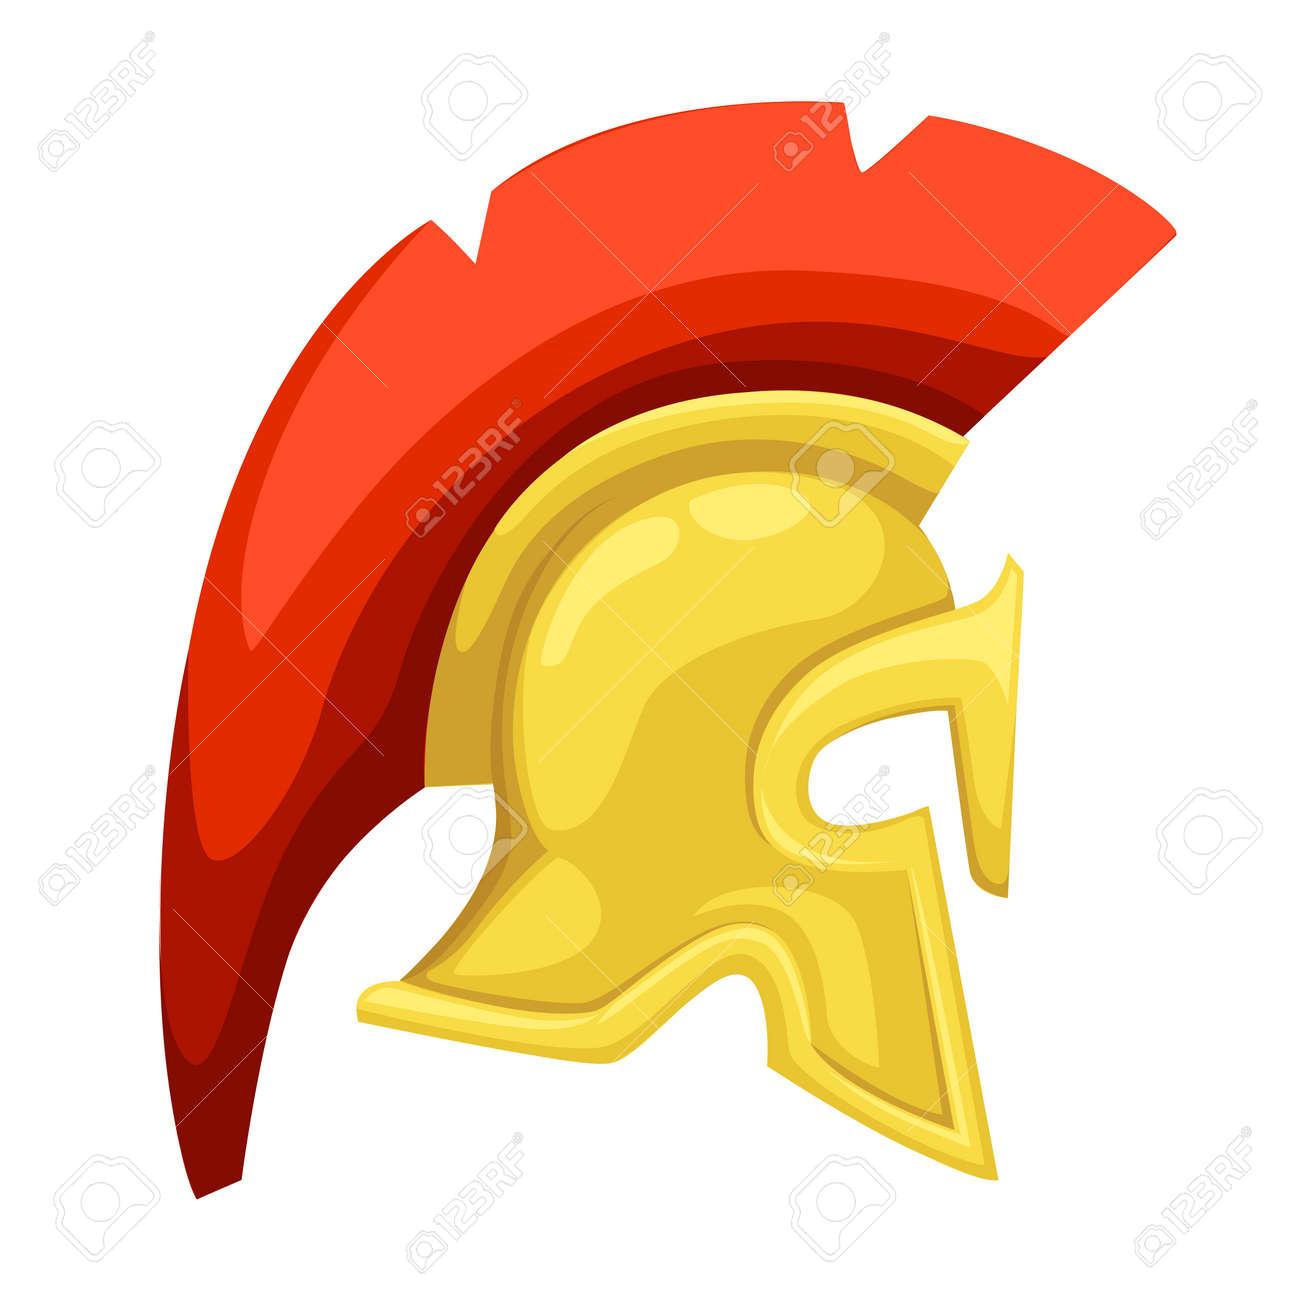 Ancient Helmet Spartan Helmet Isolated Illustration Greek Warrior